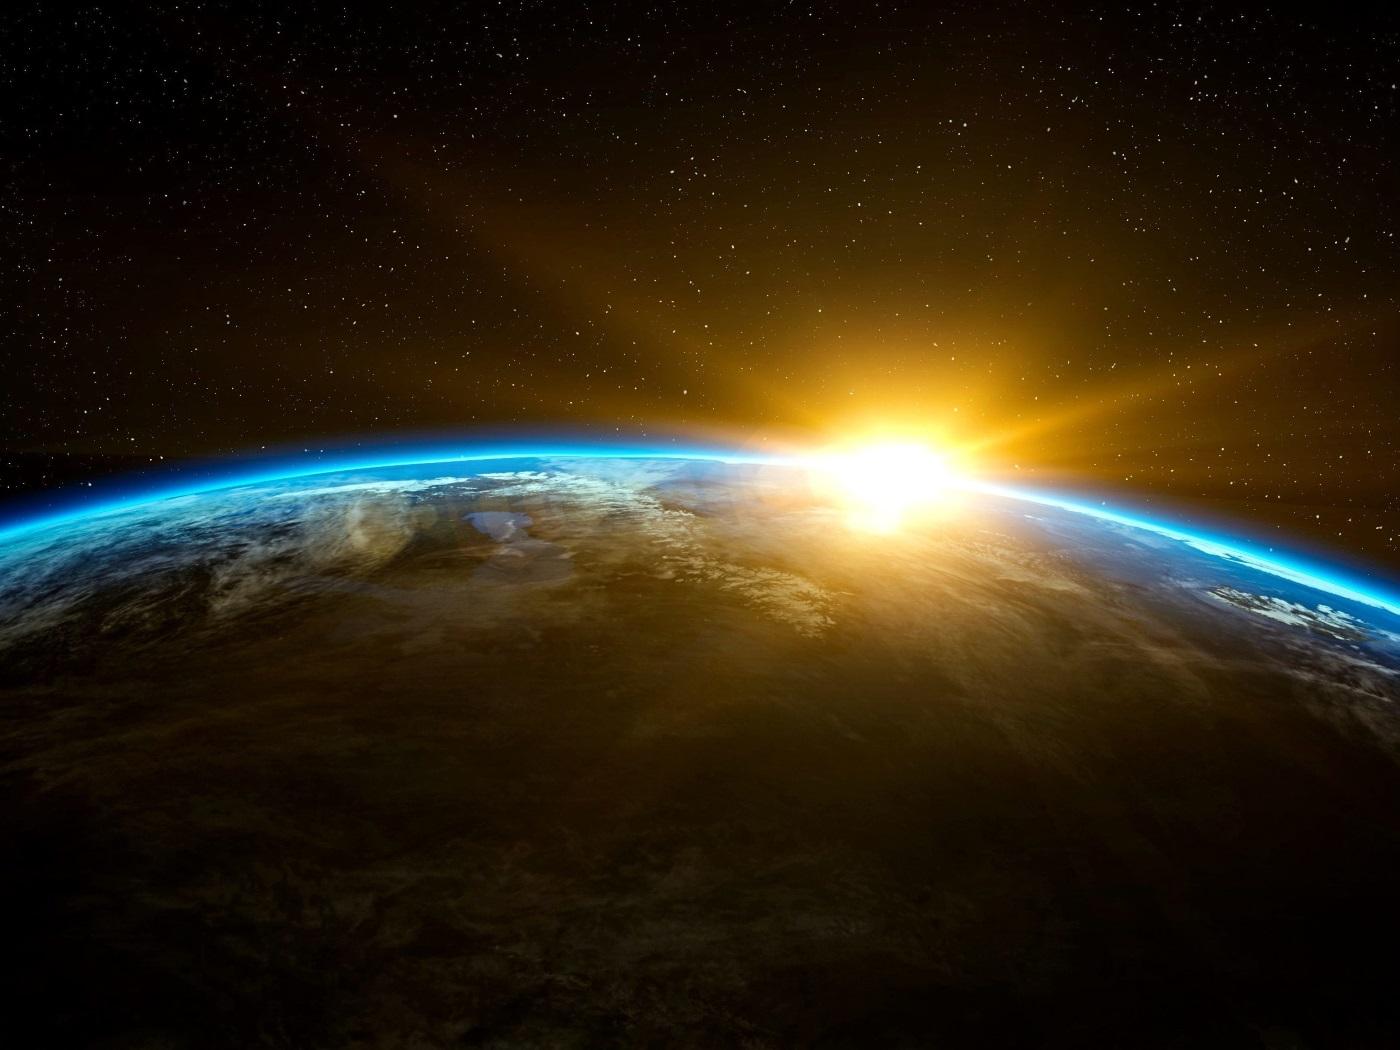 Sol e planeta Terra